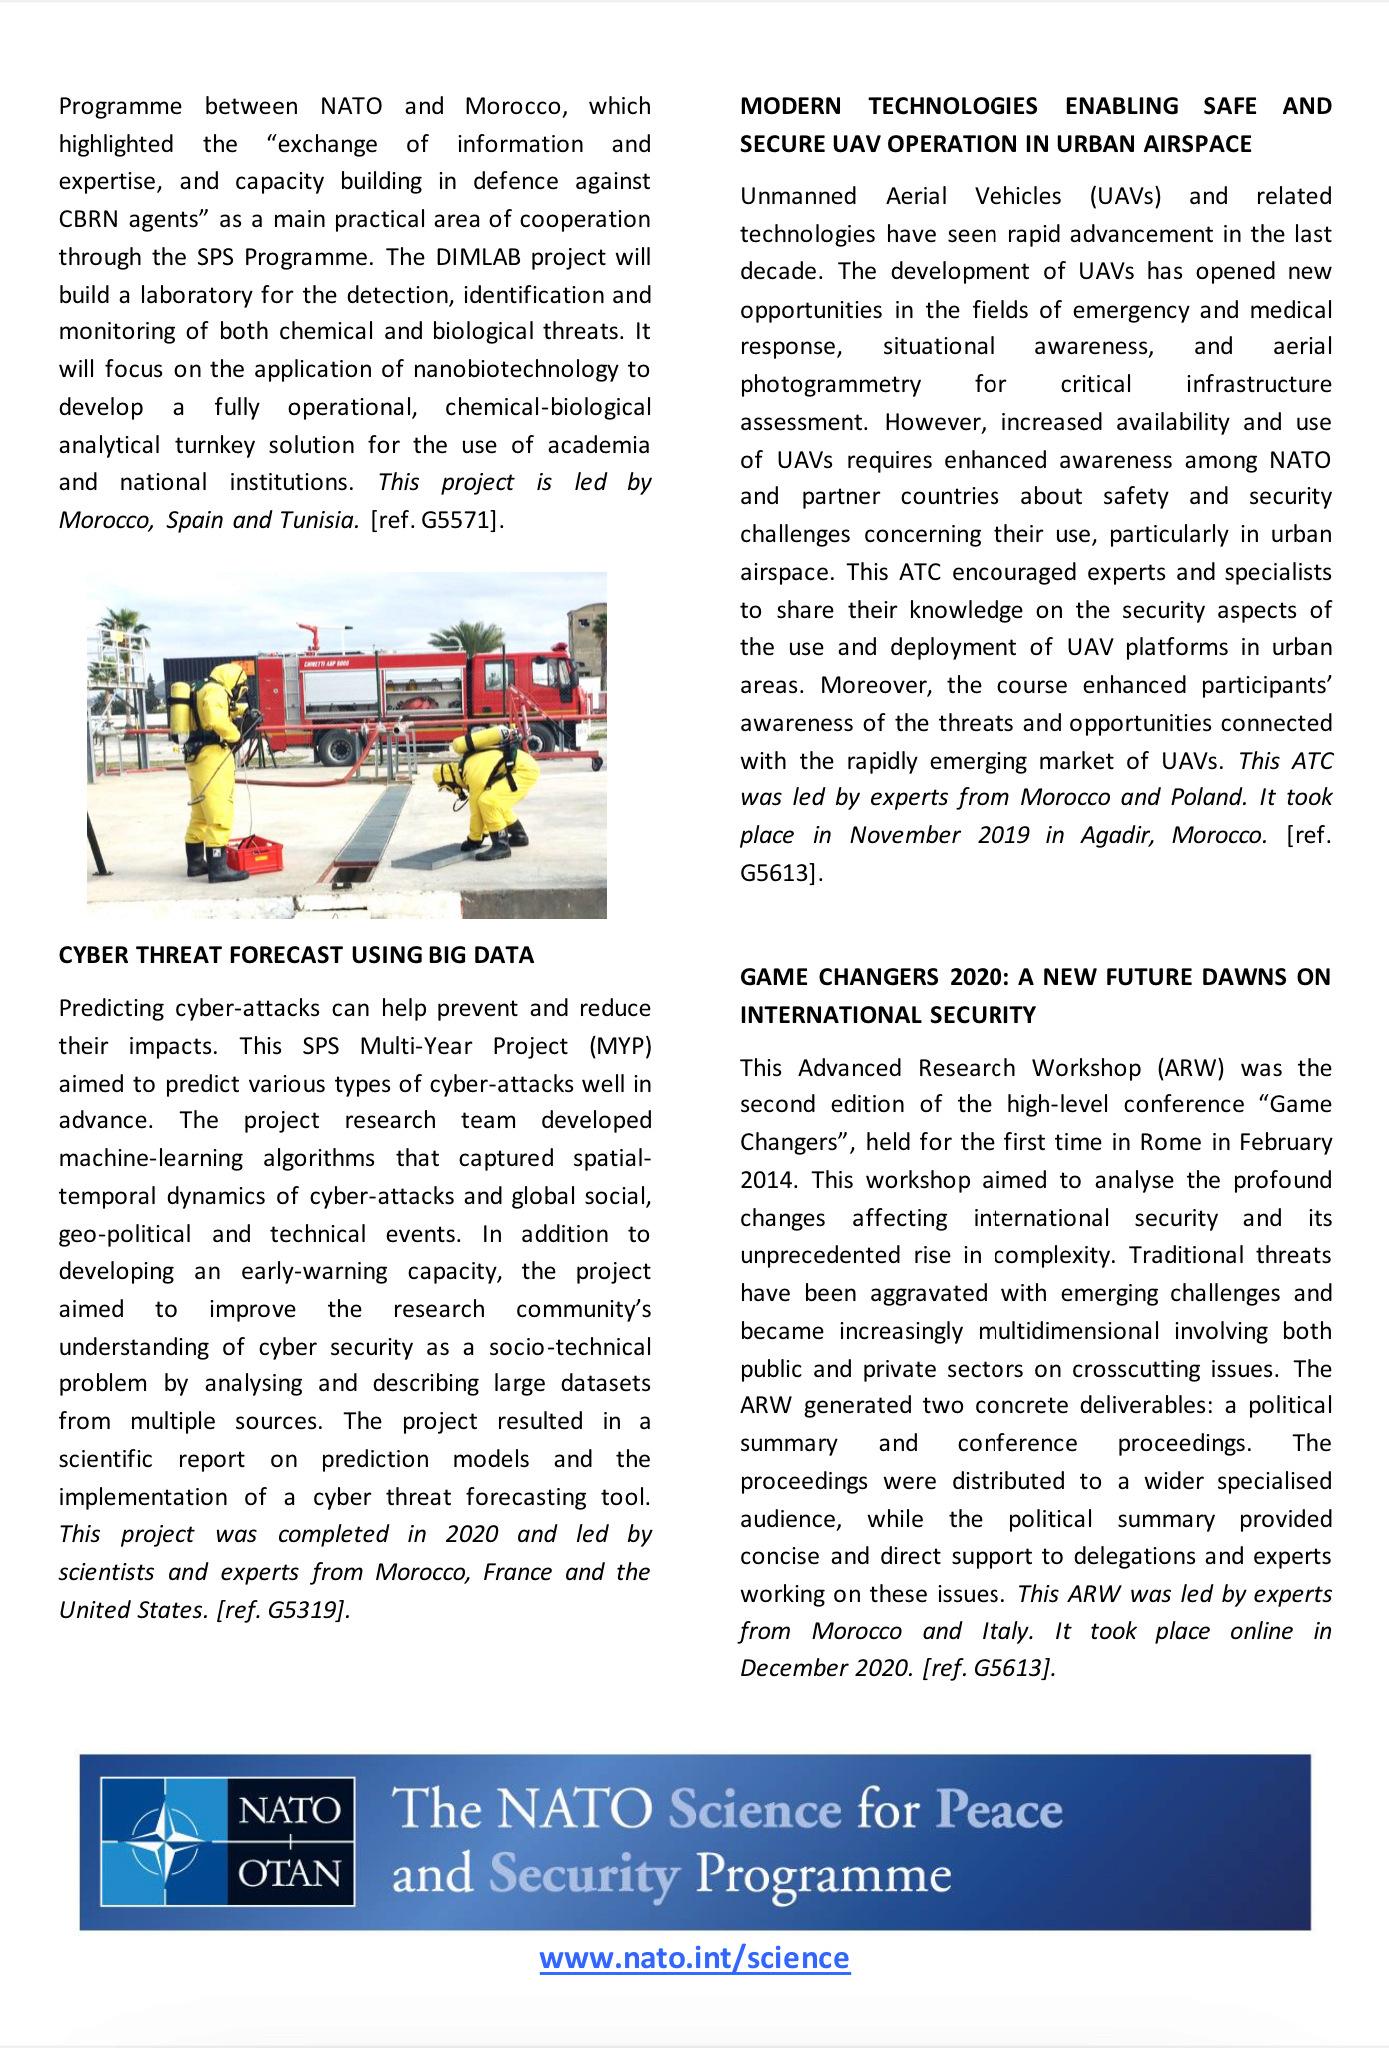 Les relations Maroc - OTAN / Morocco - NATO Cooperation - Page 7 27a70810